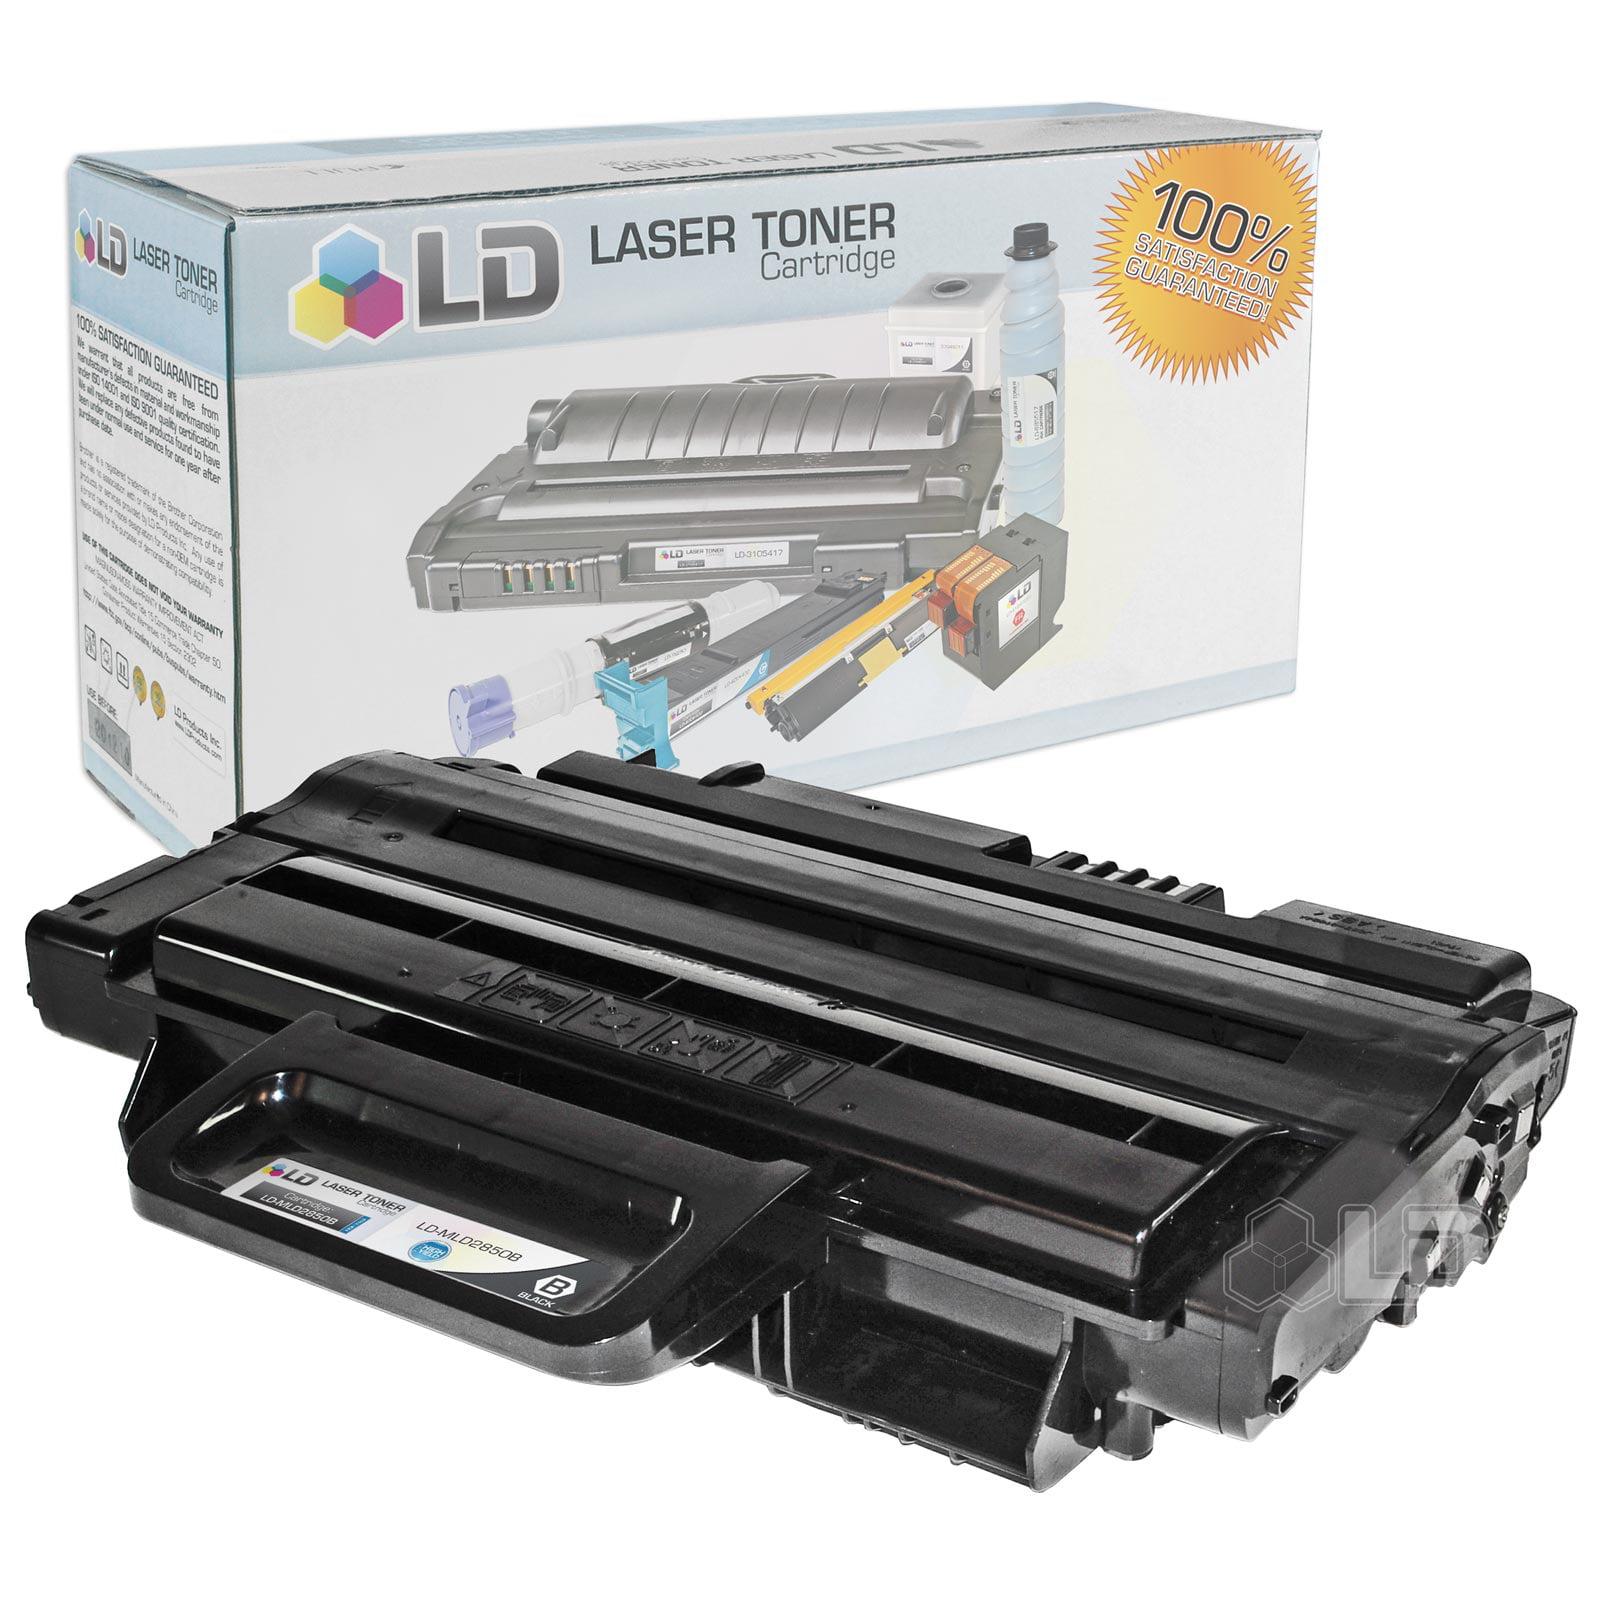 LD Compatible Samsung ML-D2850B / ML-D2850A High Yield Black Toner Cartridge for ML-2850, ML-2850D, ML-2850DR,